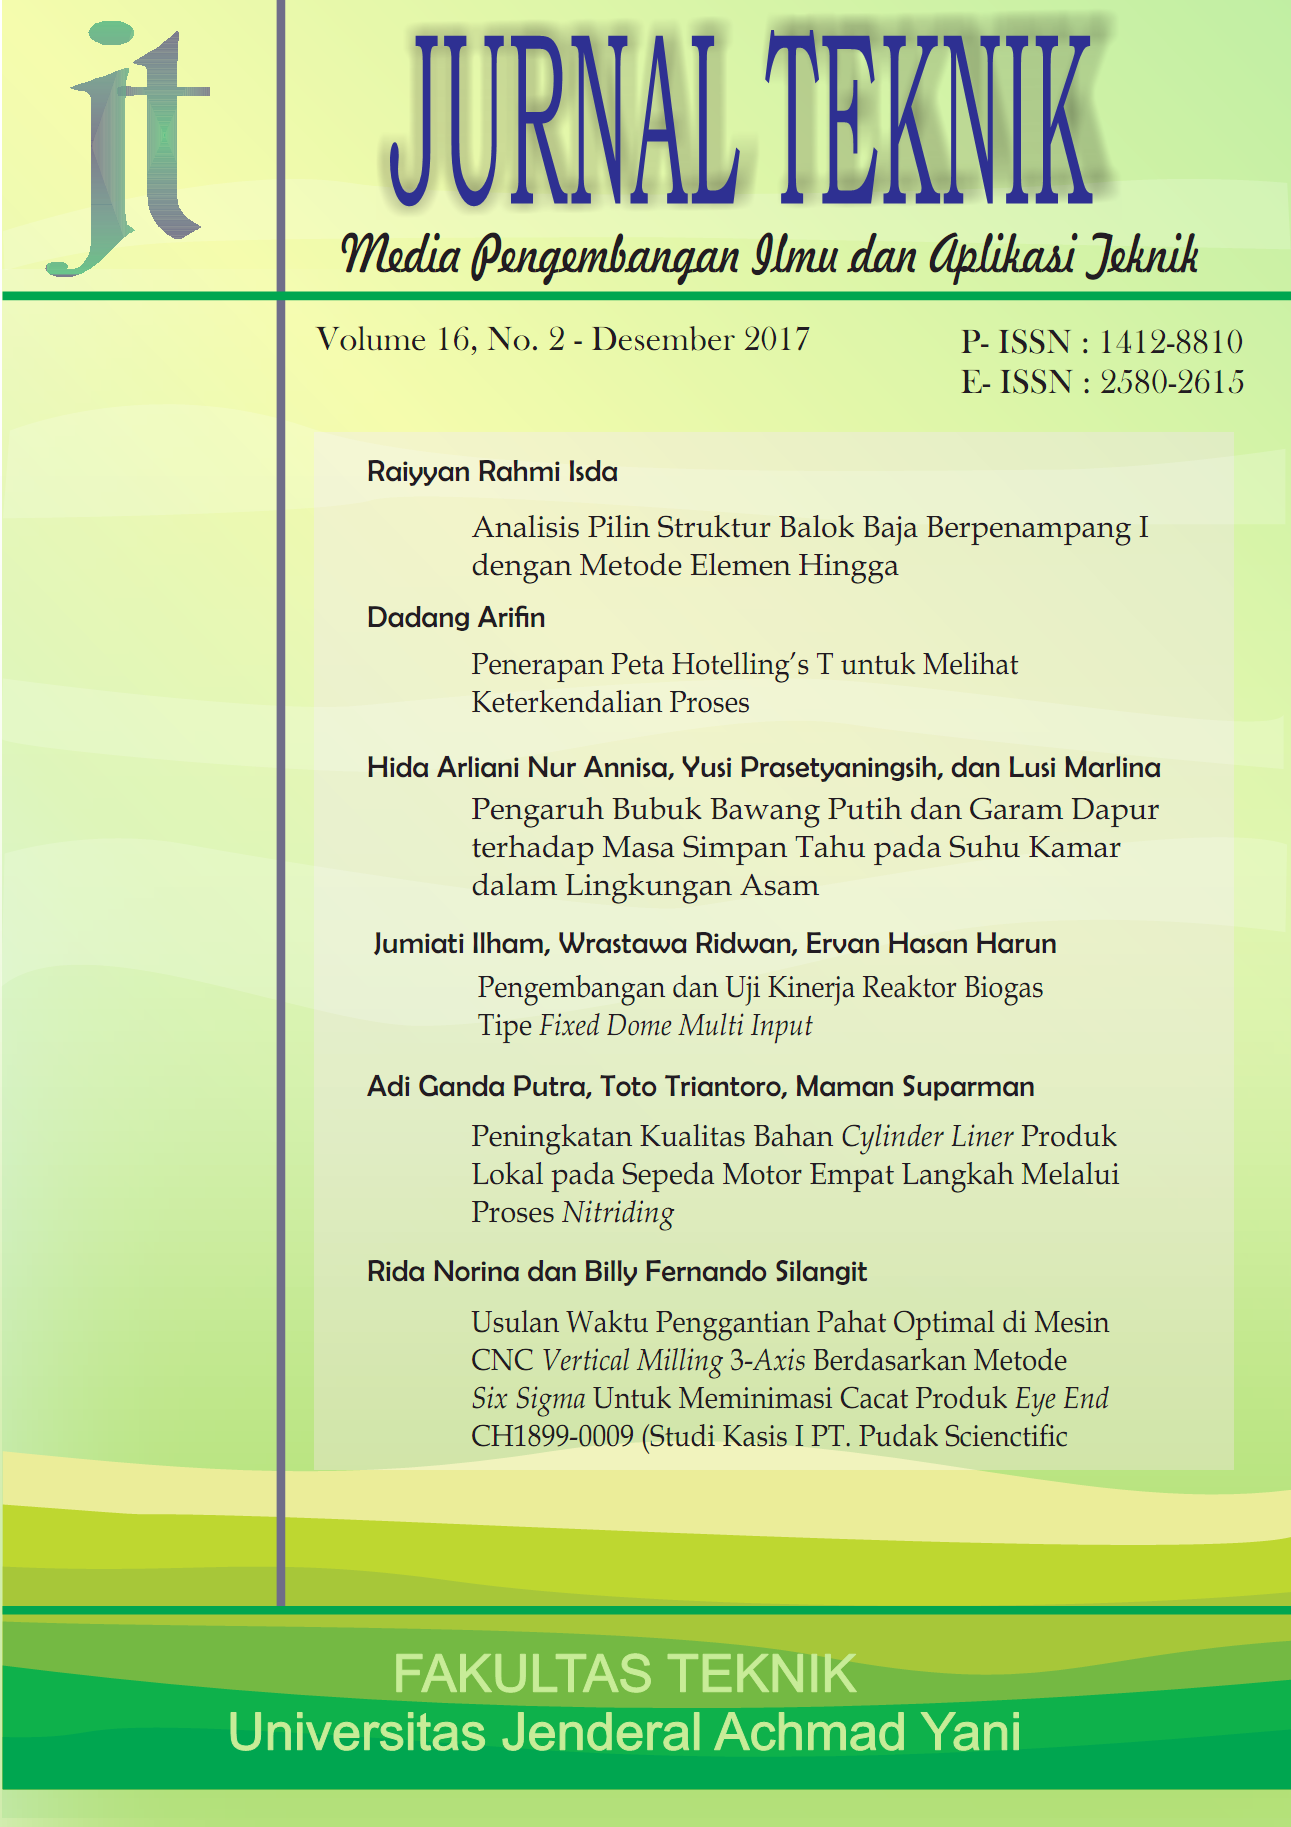 Jurnal Teknik Universitas Jenderal Achmad Yani